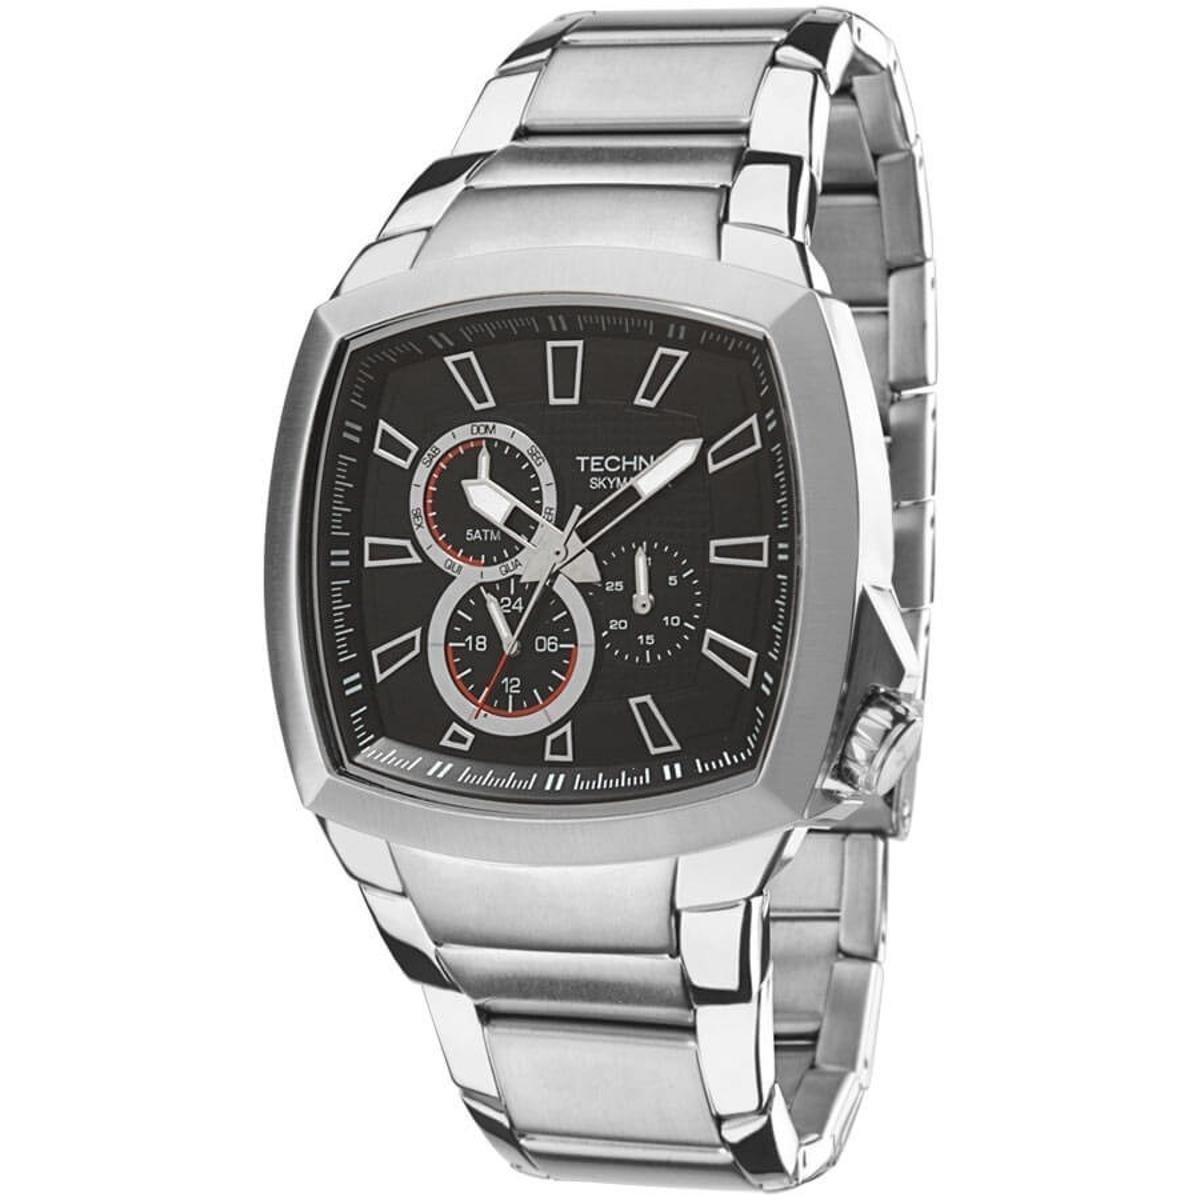 e9cd9eb2610 Relógio Technos Masculino Performance Skymaster 6P29Ahy 1P - Compre Agora